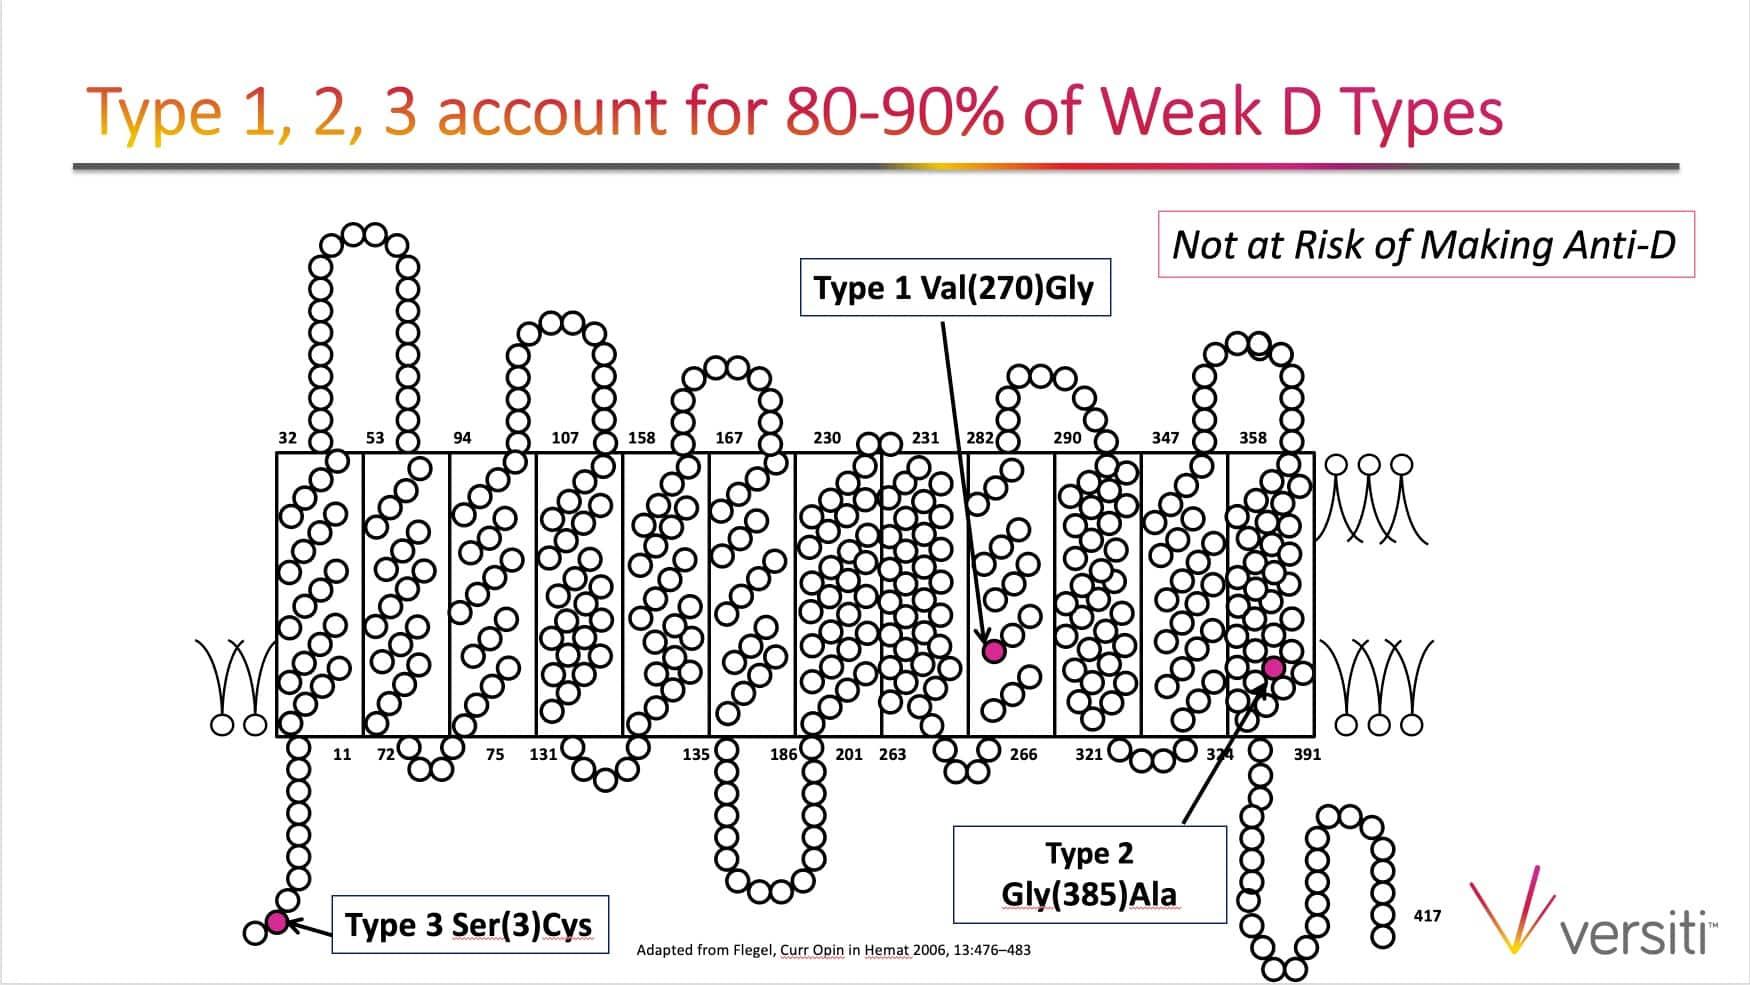 Slide 4: Weak D types 1, 2, and 3 predominate